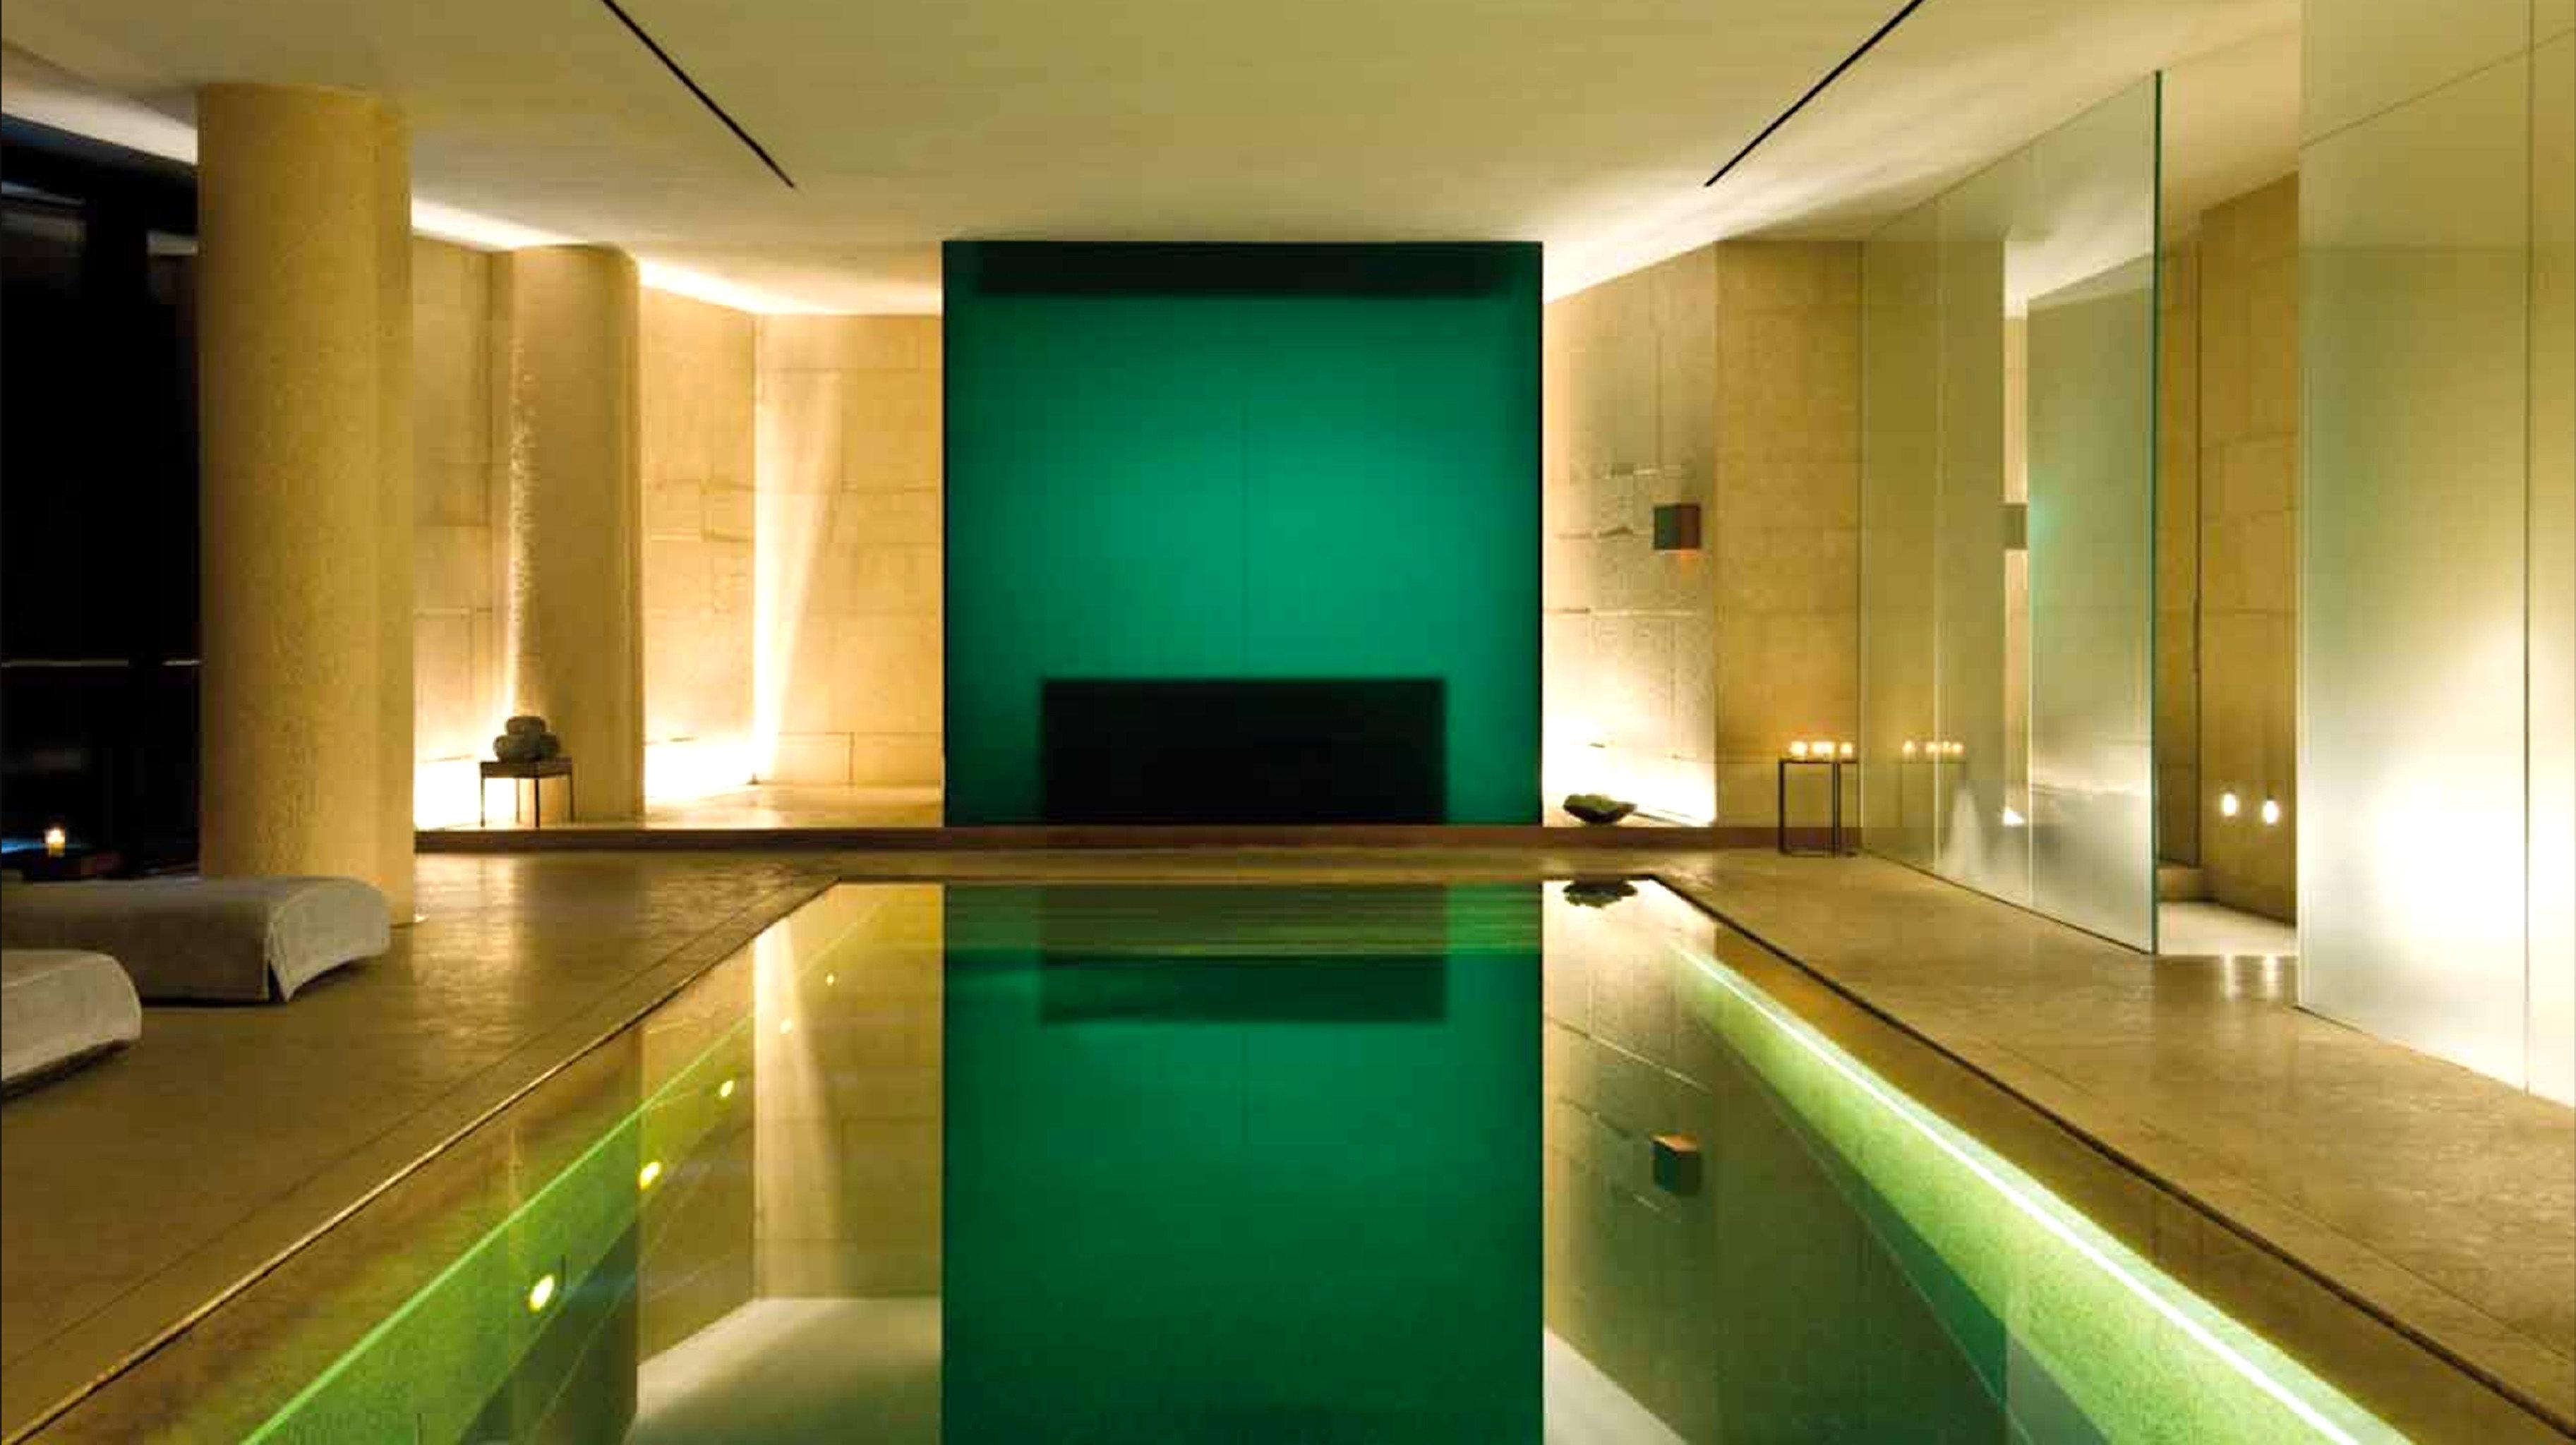 Luxury Modern Pool green swimming pool property lighting bathroom Suite bathtub